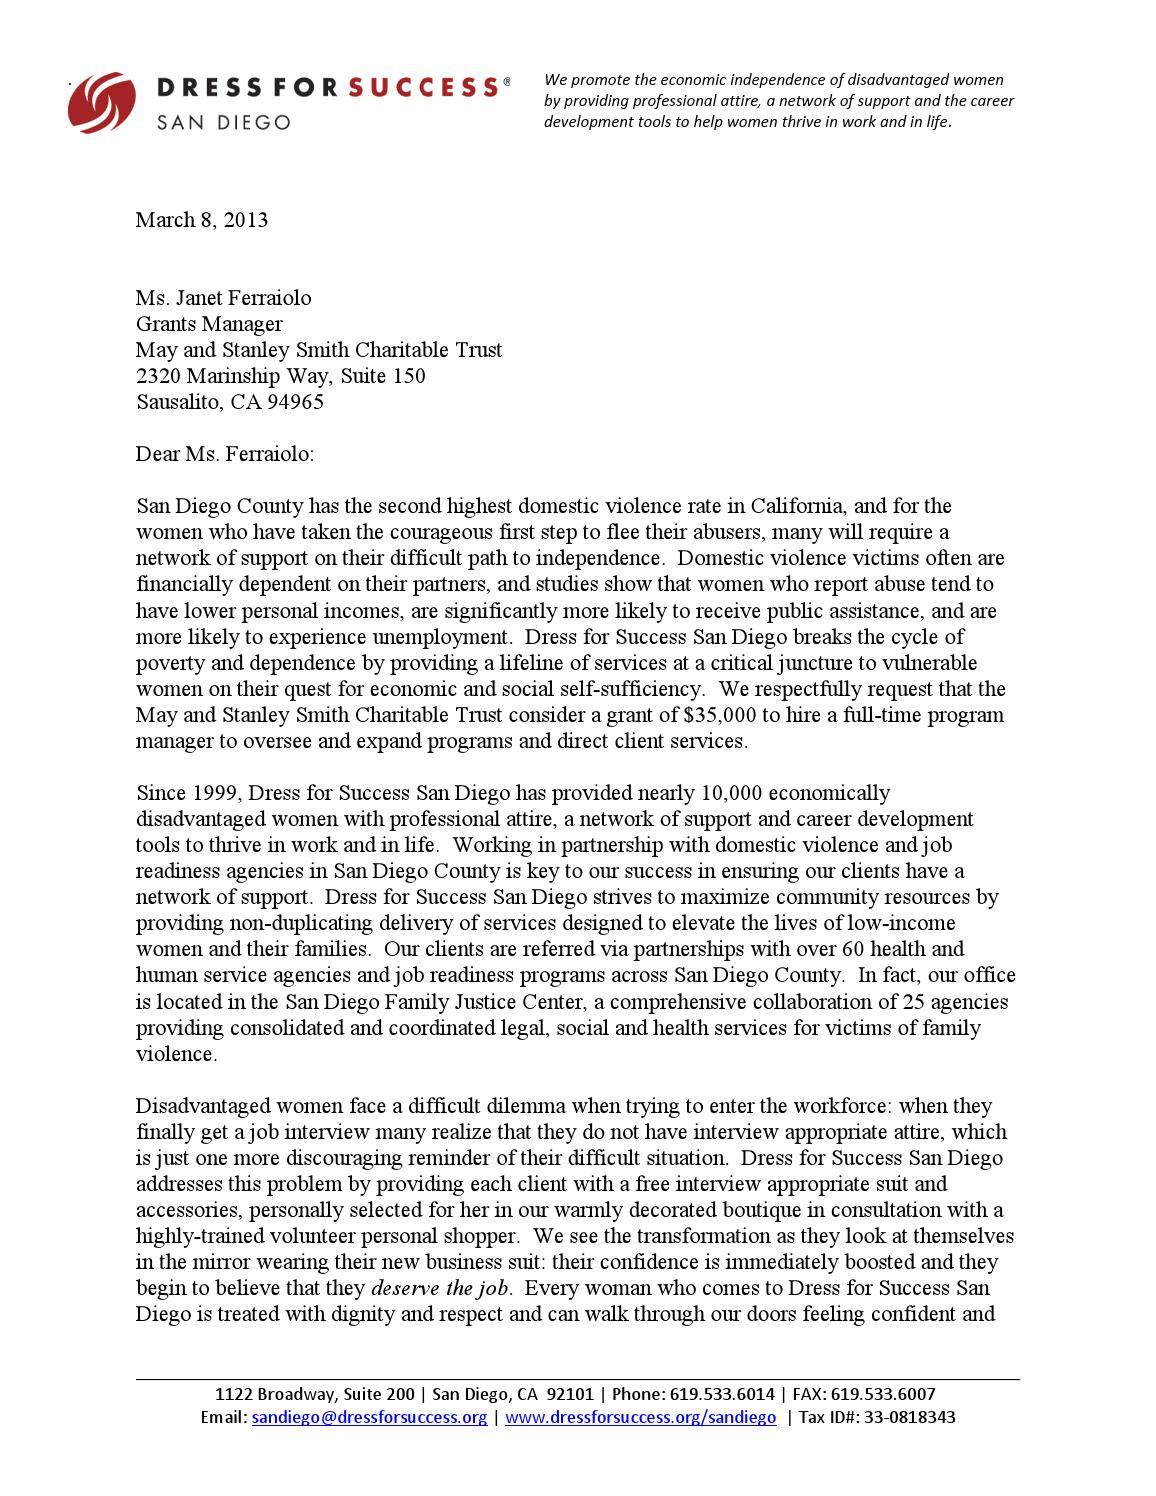 sample grant loi  letter of intent  by derek floyd  m a